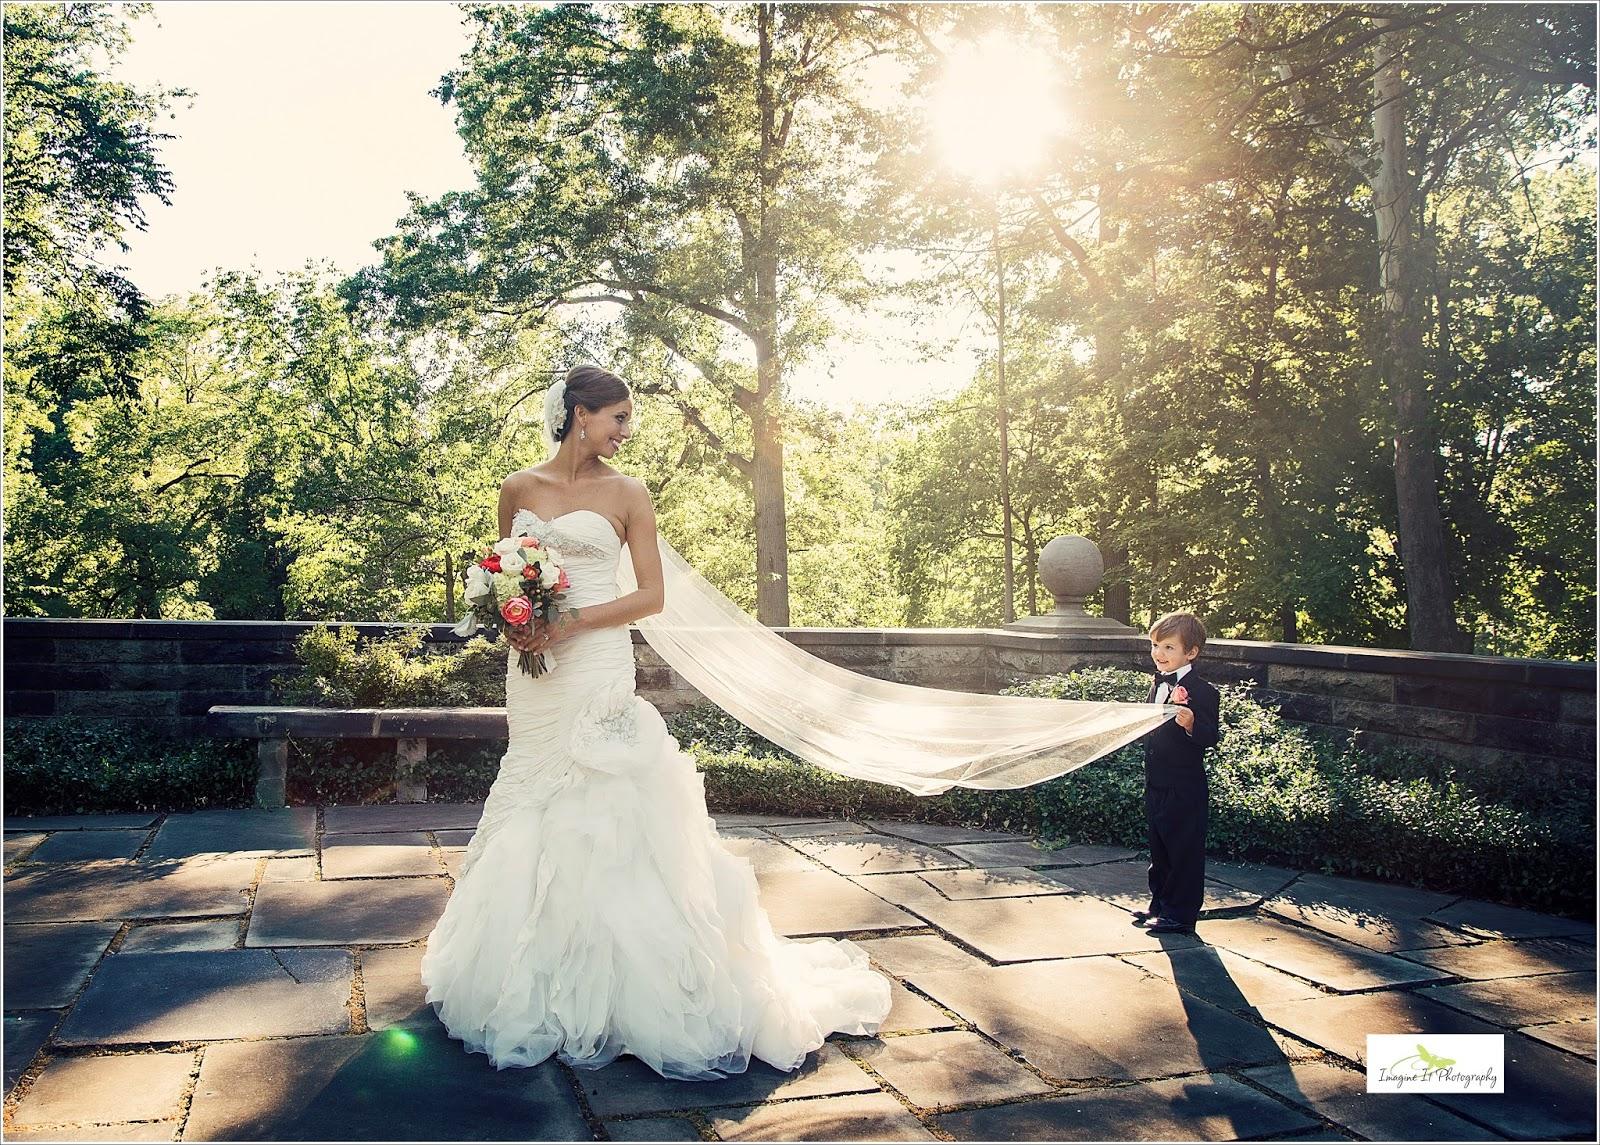 Tudor Arms Hotel Wedding- Callie & Zac | Imagine It Photography